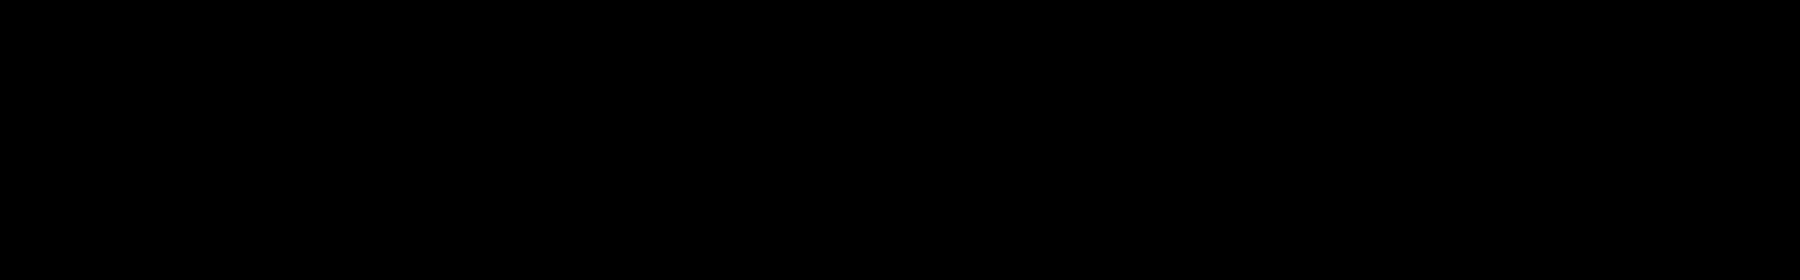 Abstract Lo-Fi audio waveform